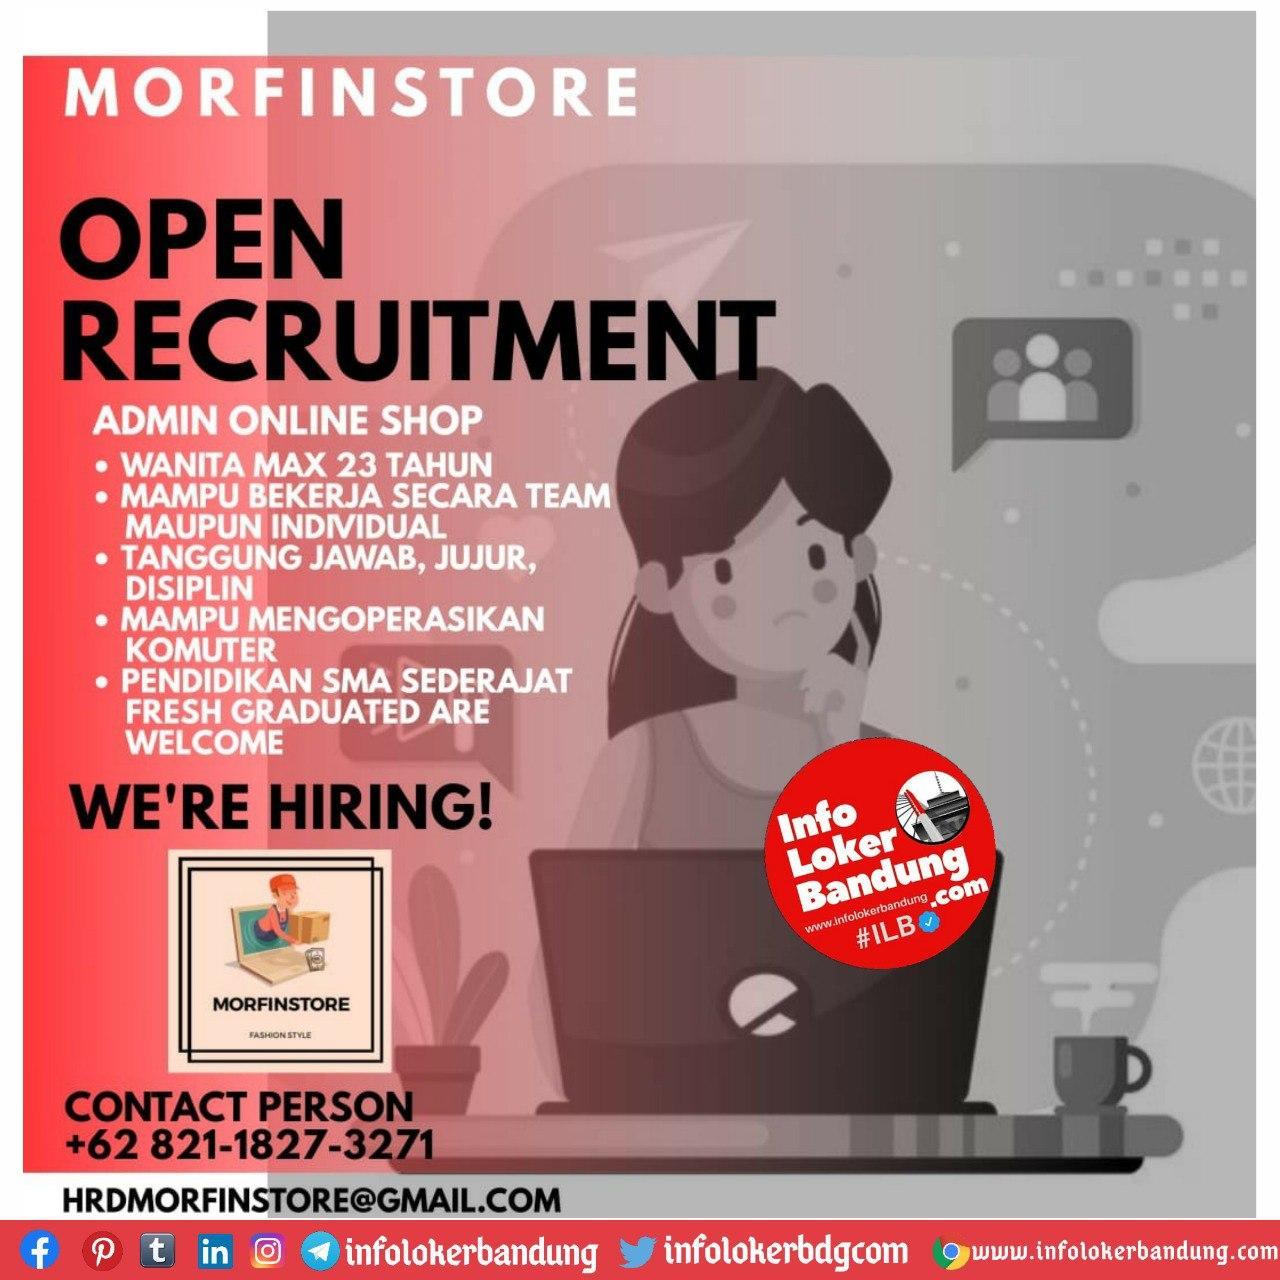 Lowongan Kerja Admin Online Shop Morfin Store Bandung September 2020